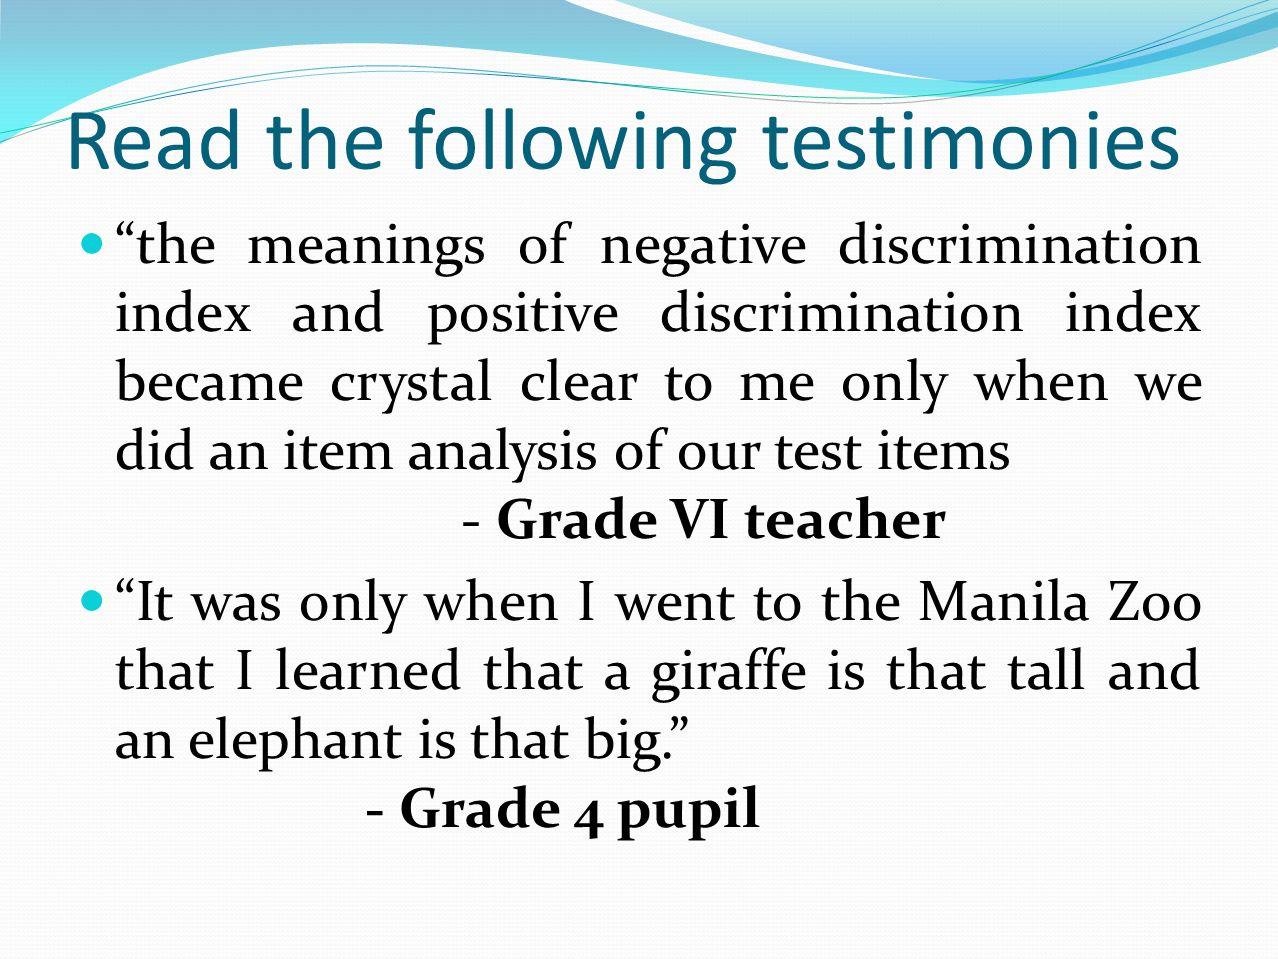 Read the following testimonies